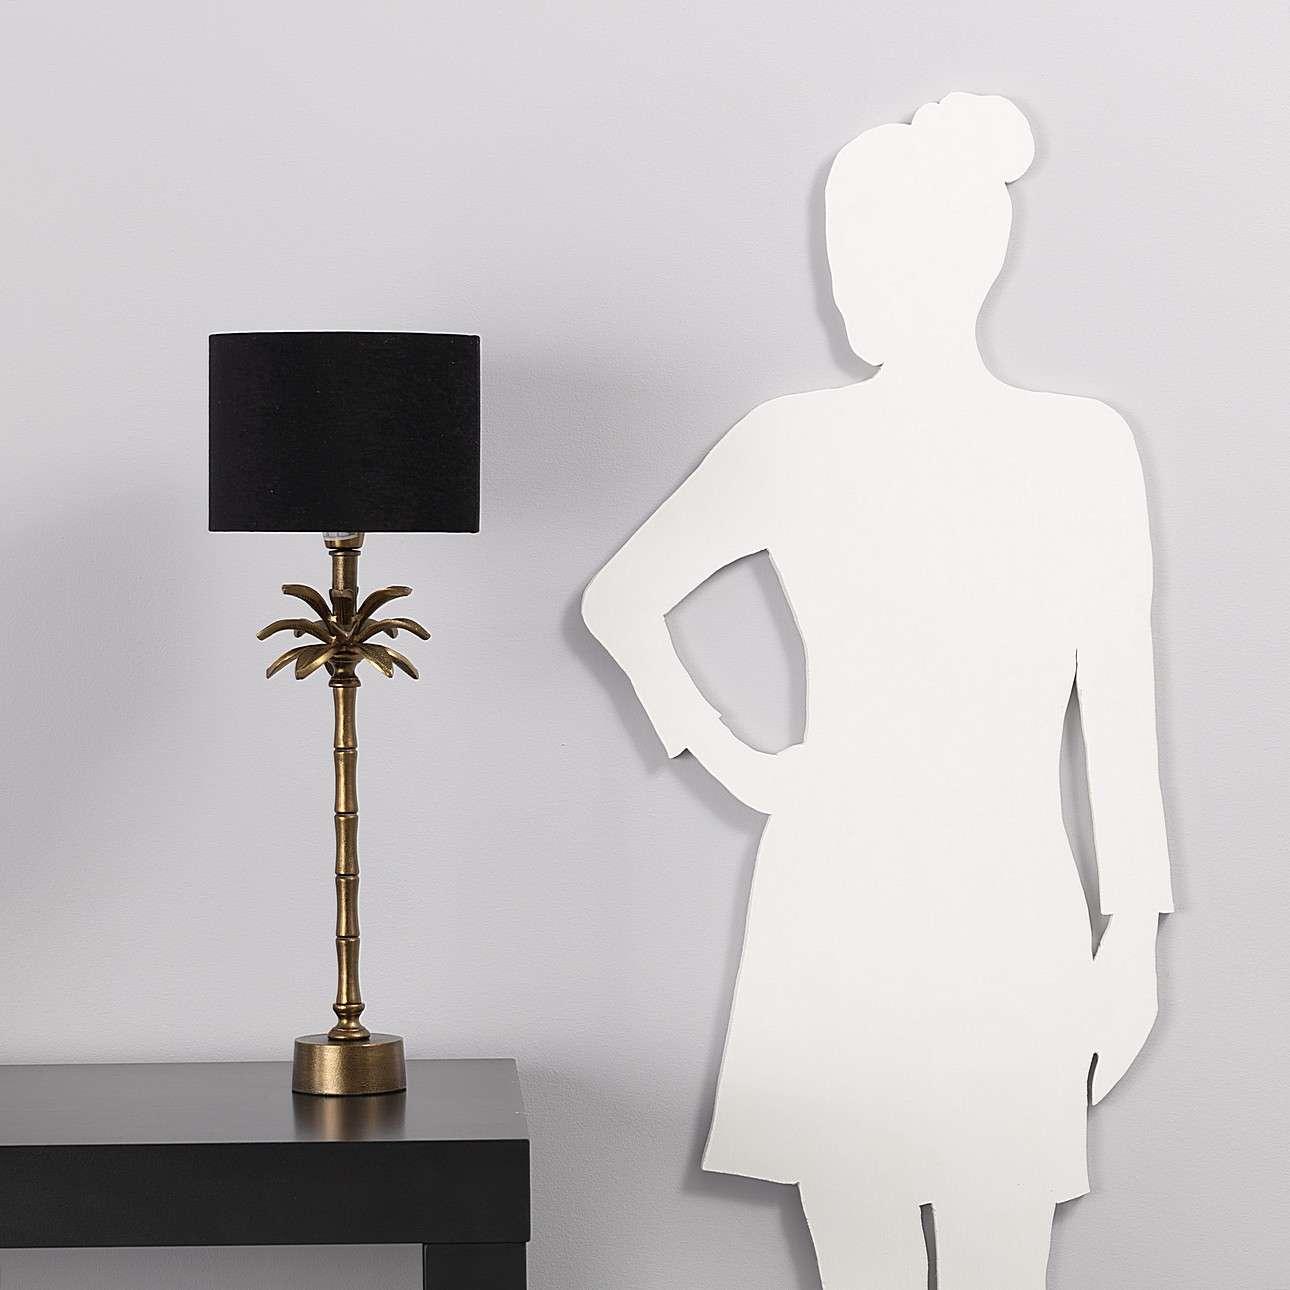 Tischlampe Tropical Glam 70,5 cm